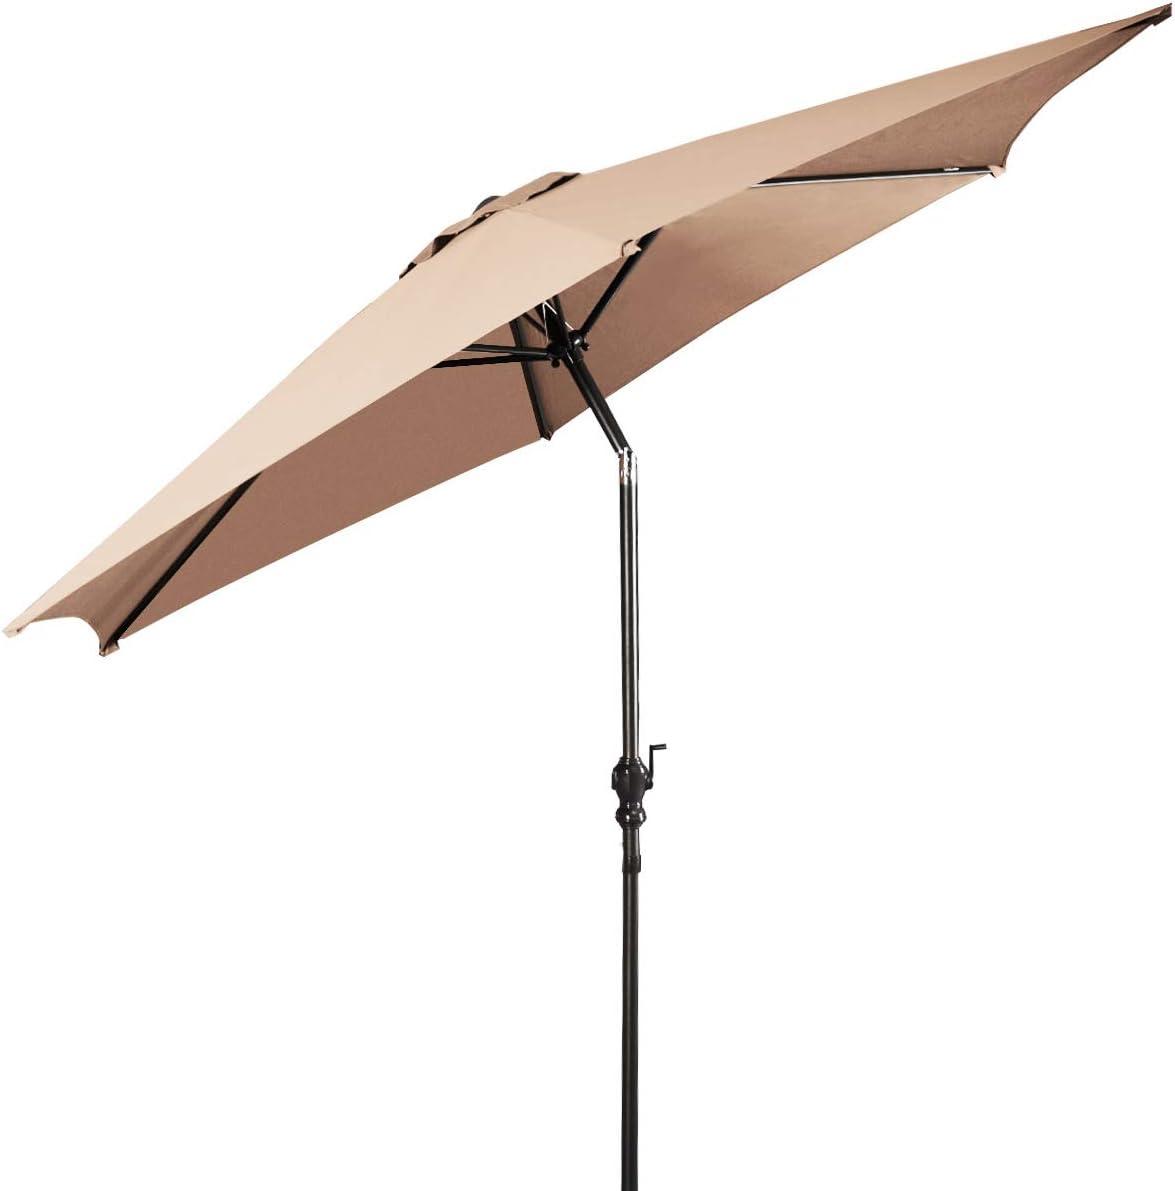 10Ft Outdoor Patio Umbrella Market Table Umbrella with Crank Strong Steel Ribs for Garden Pool Deck Patio Beach Backyard,Beige